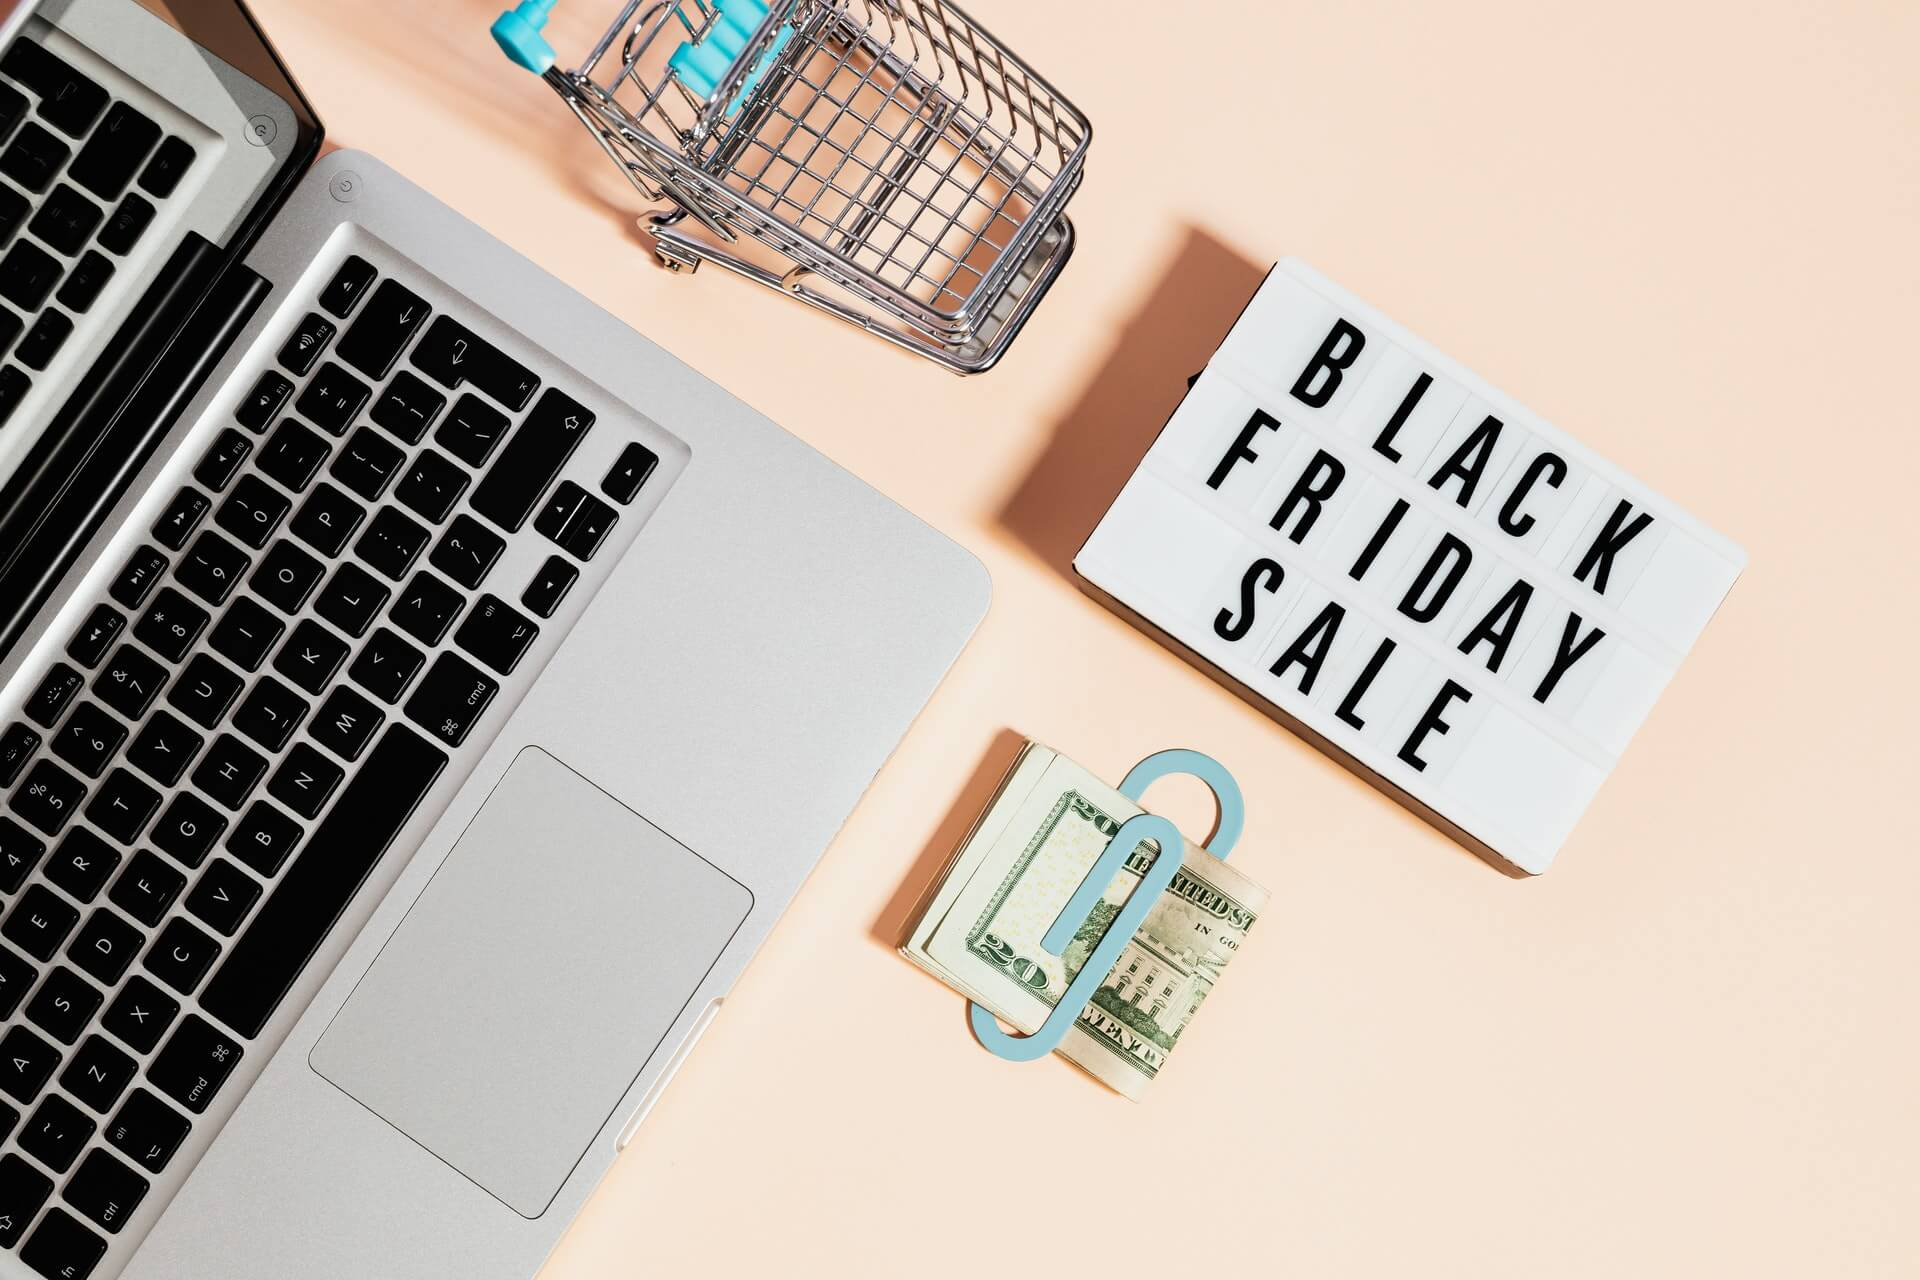 Onlineshop Marketing Black Friday